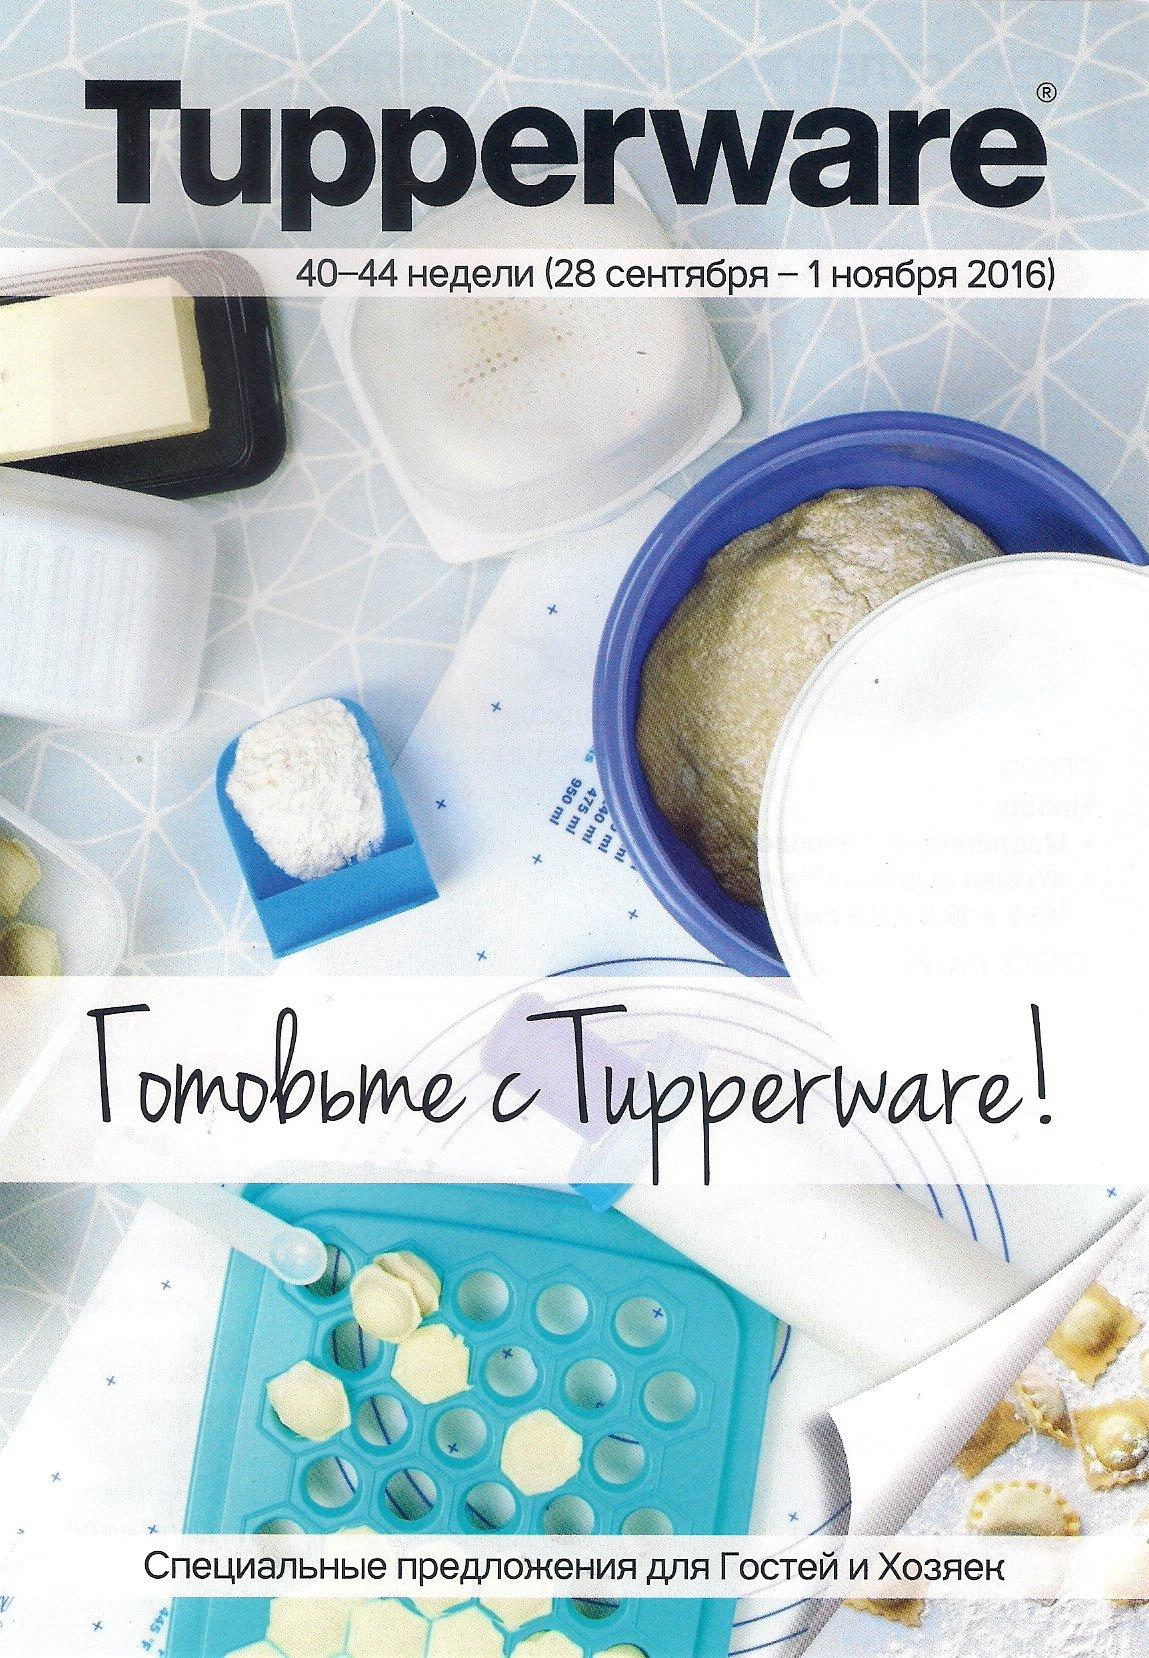 http://tupperware-online.ru/images/upload/1d.jpg